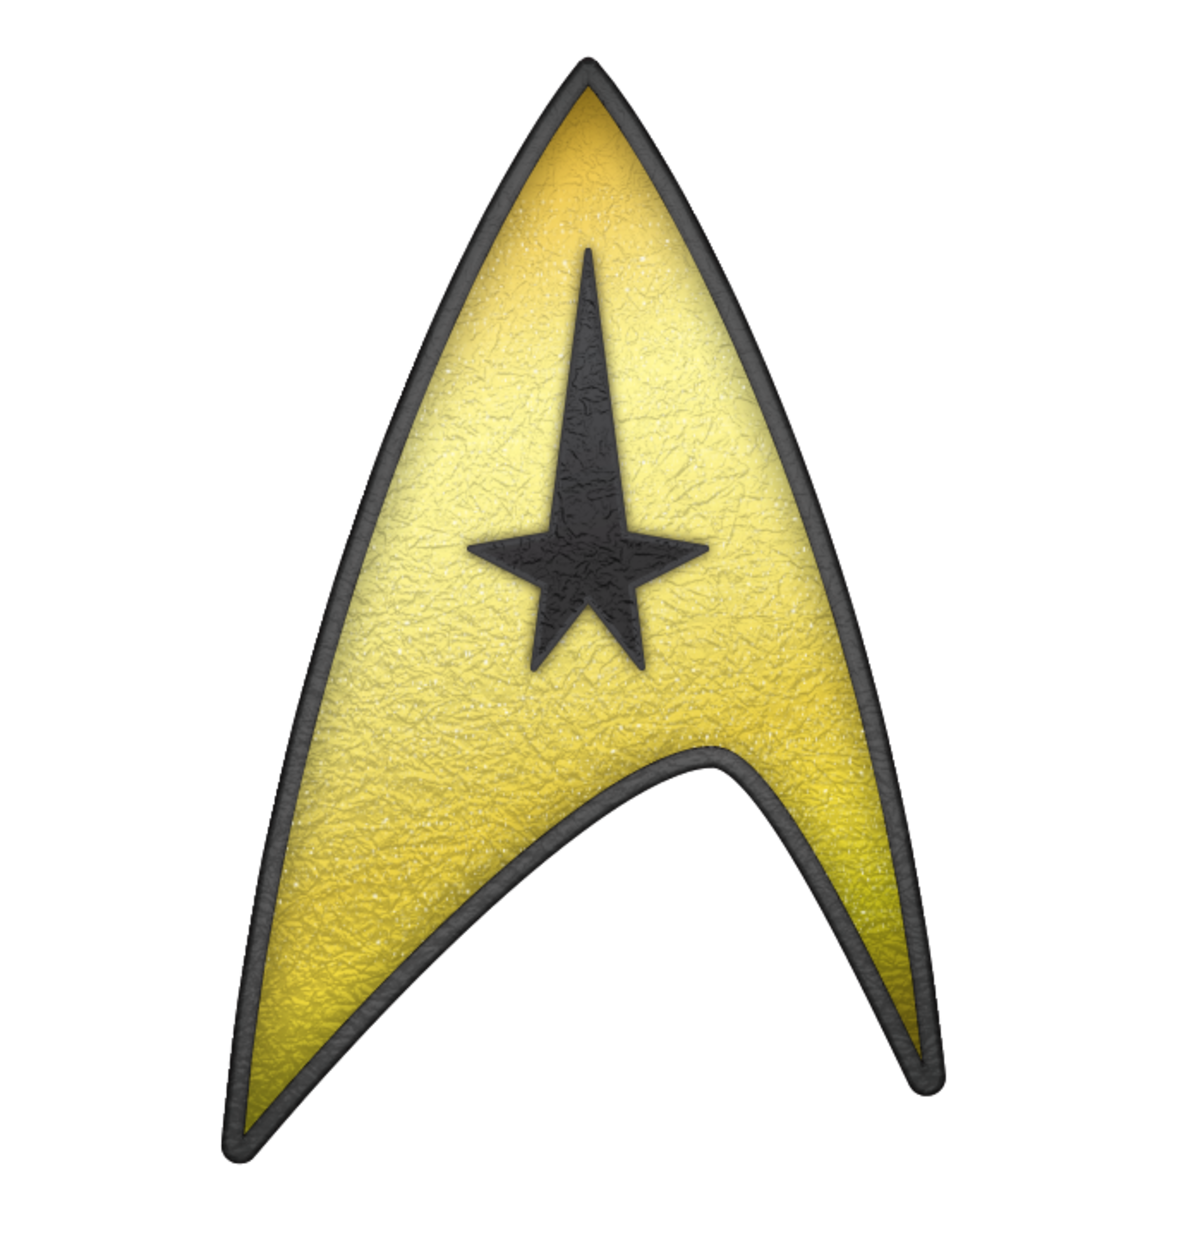 Uss Enterprise Ncc 1701 Memory Alpha Fandom Powered By Wikia